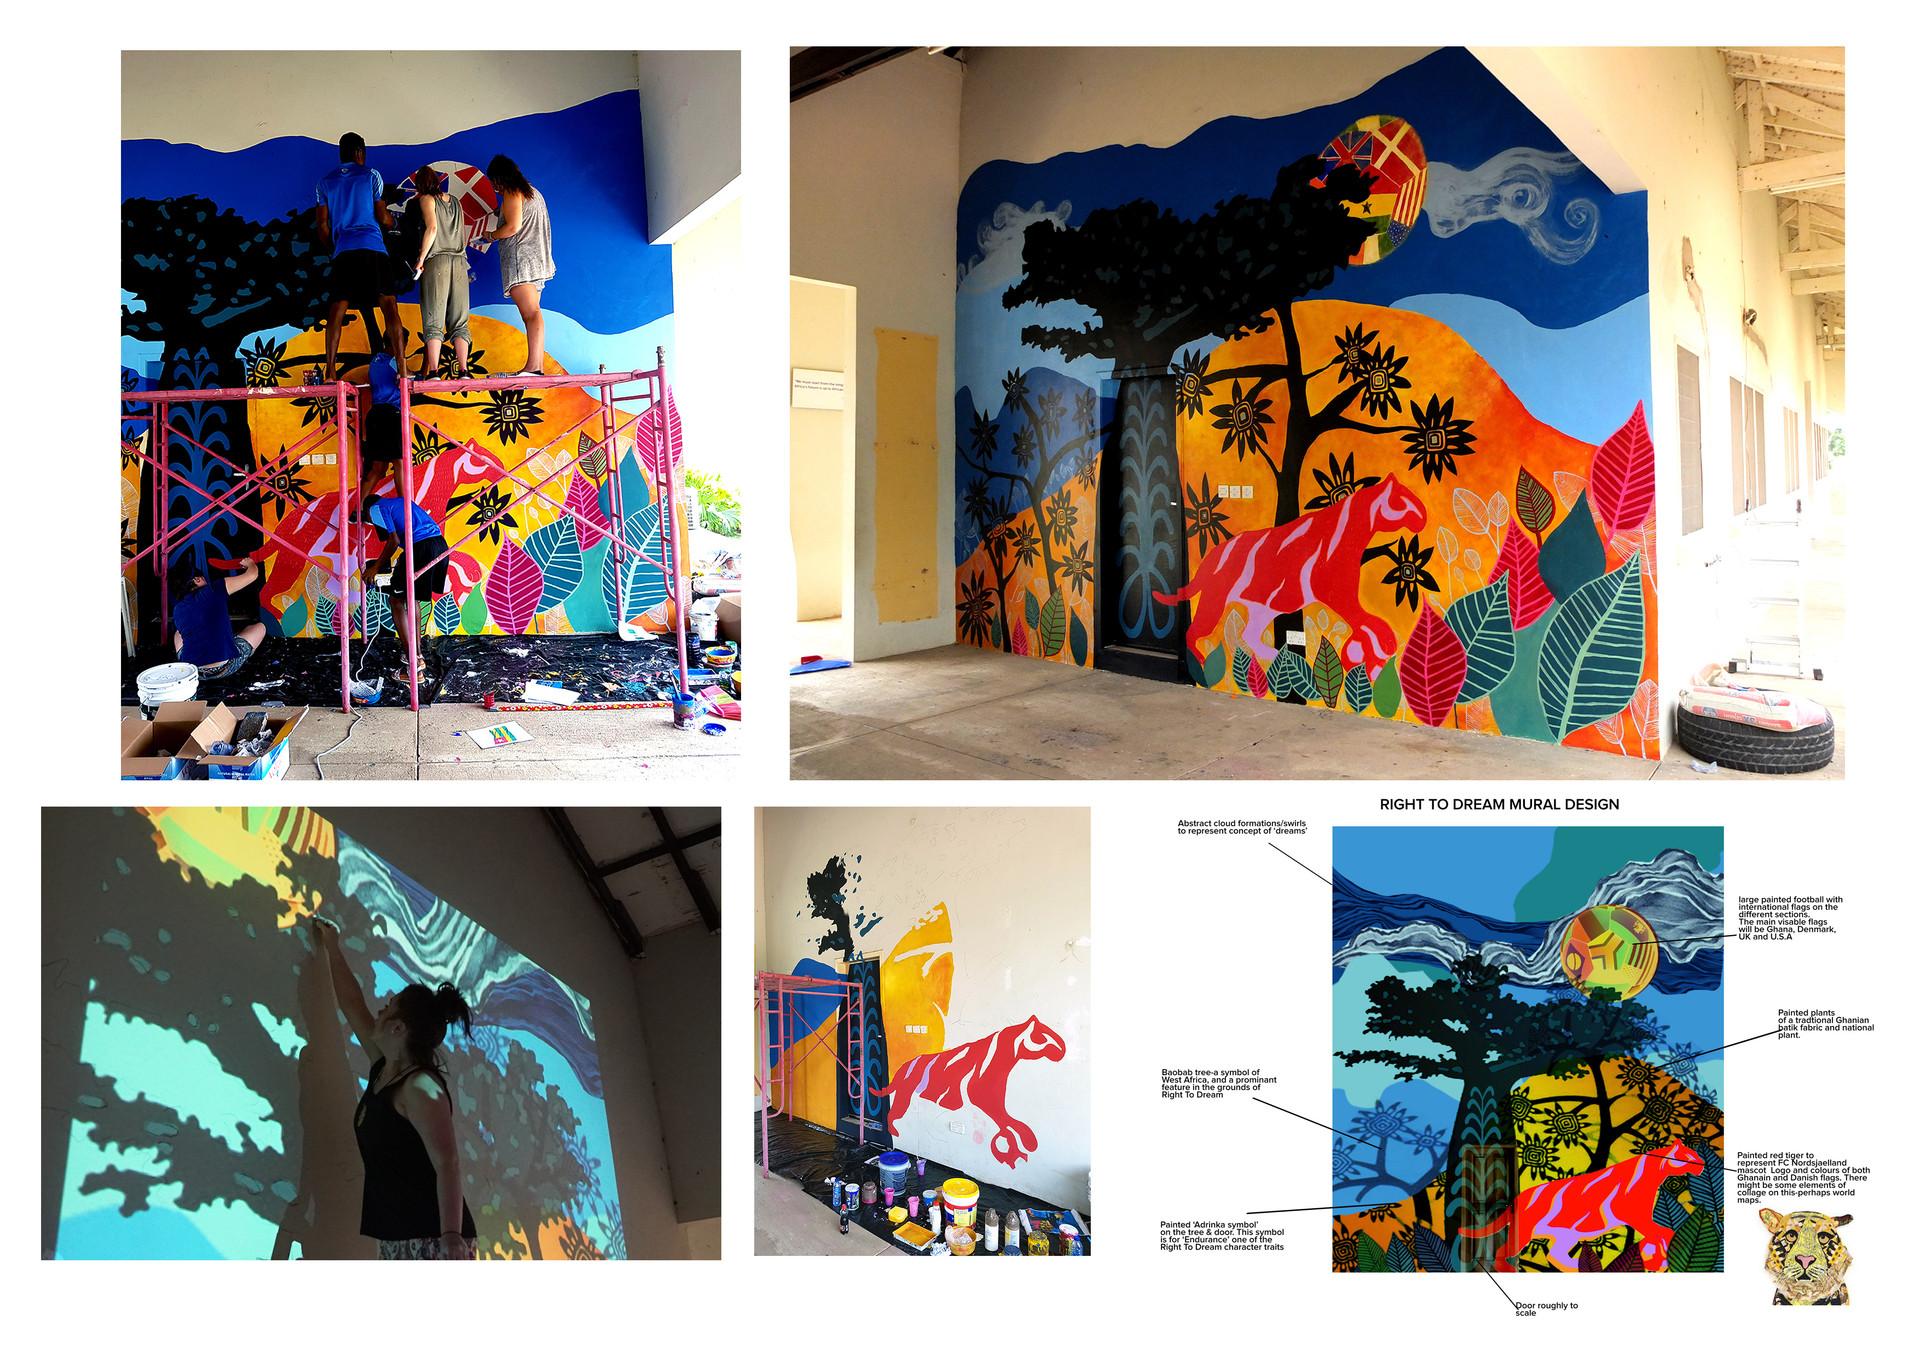 Right to Dream Football Academy, Ghana, mural design, Feb 2017